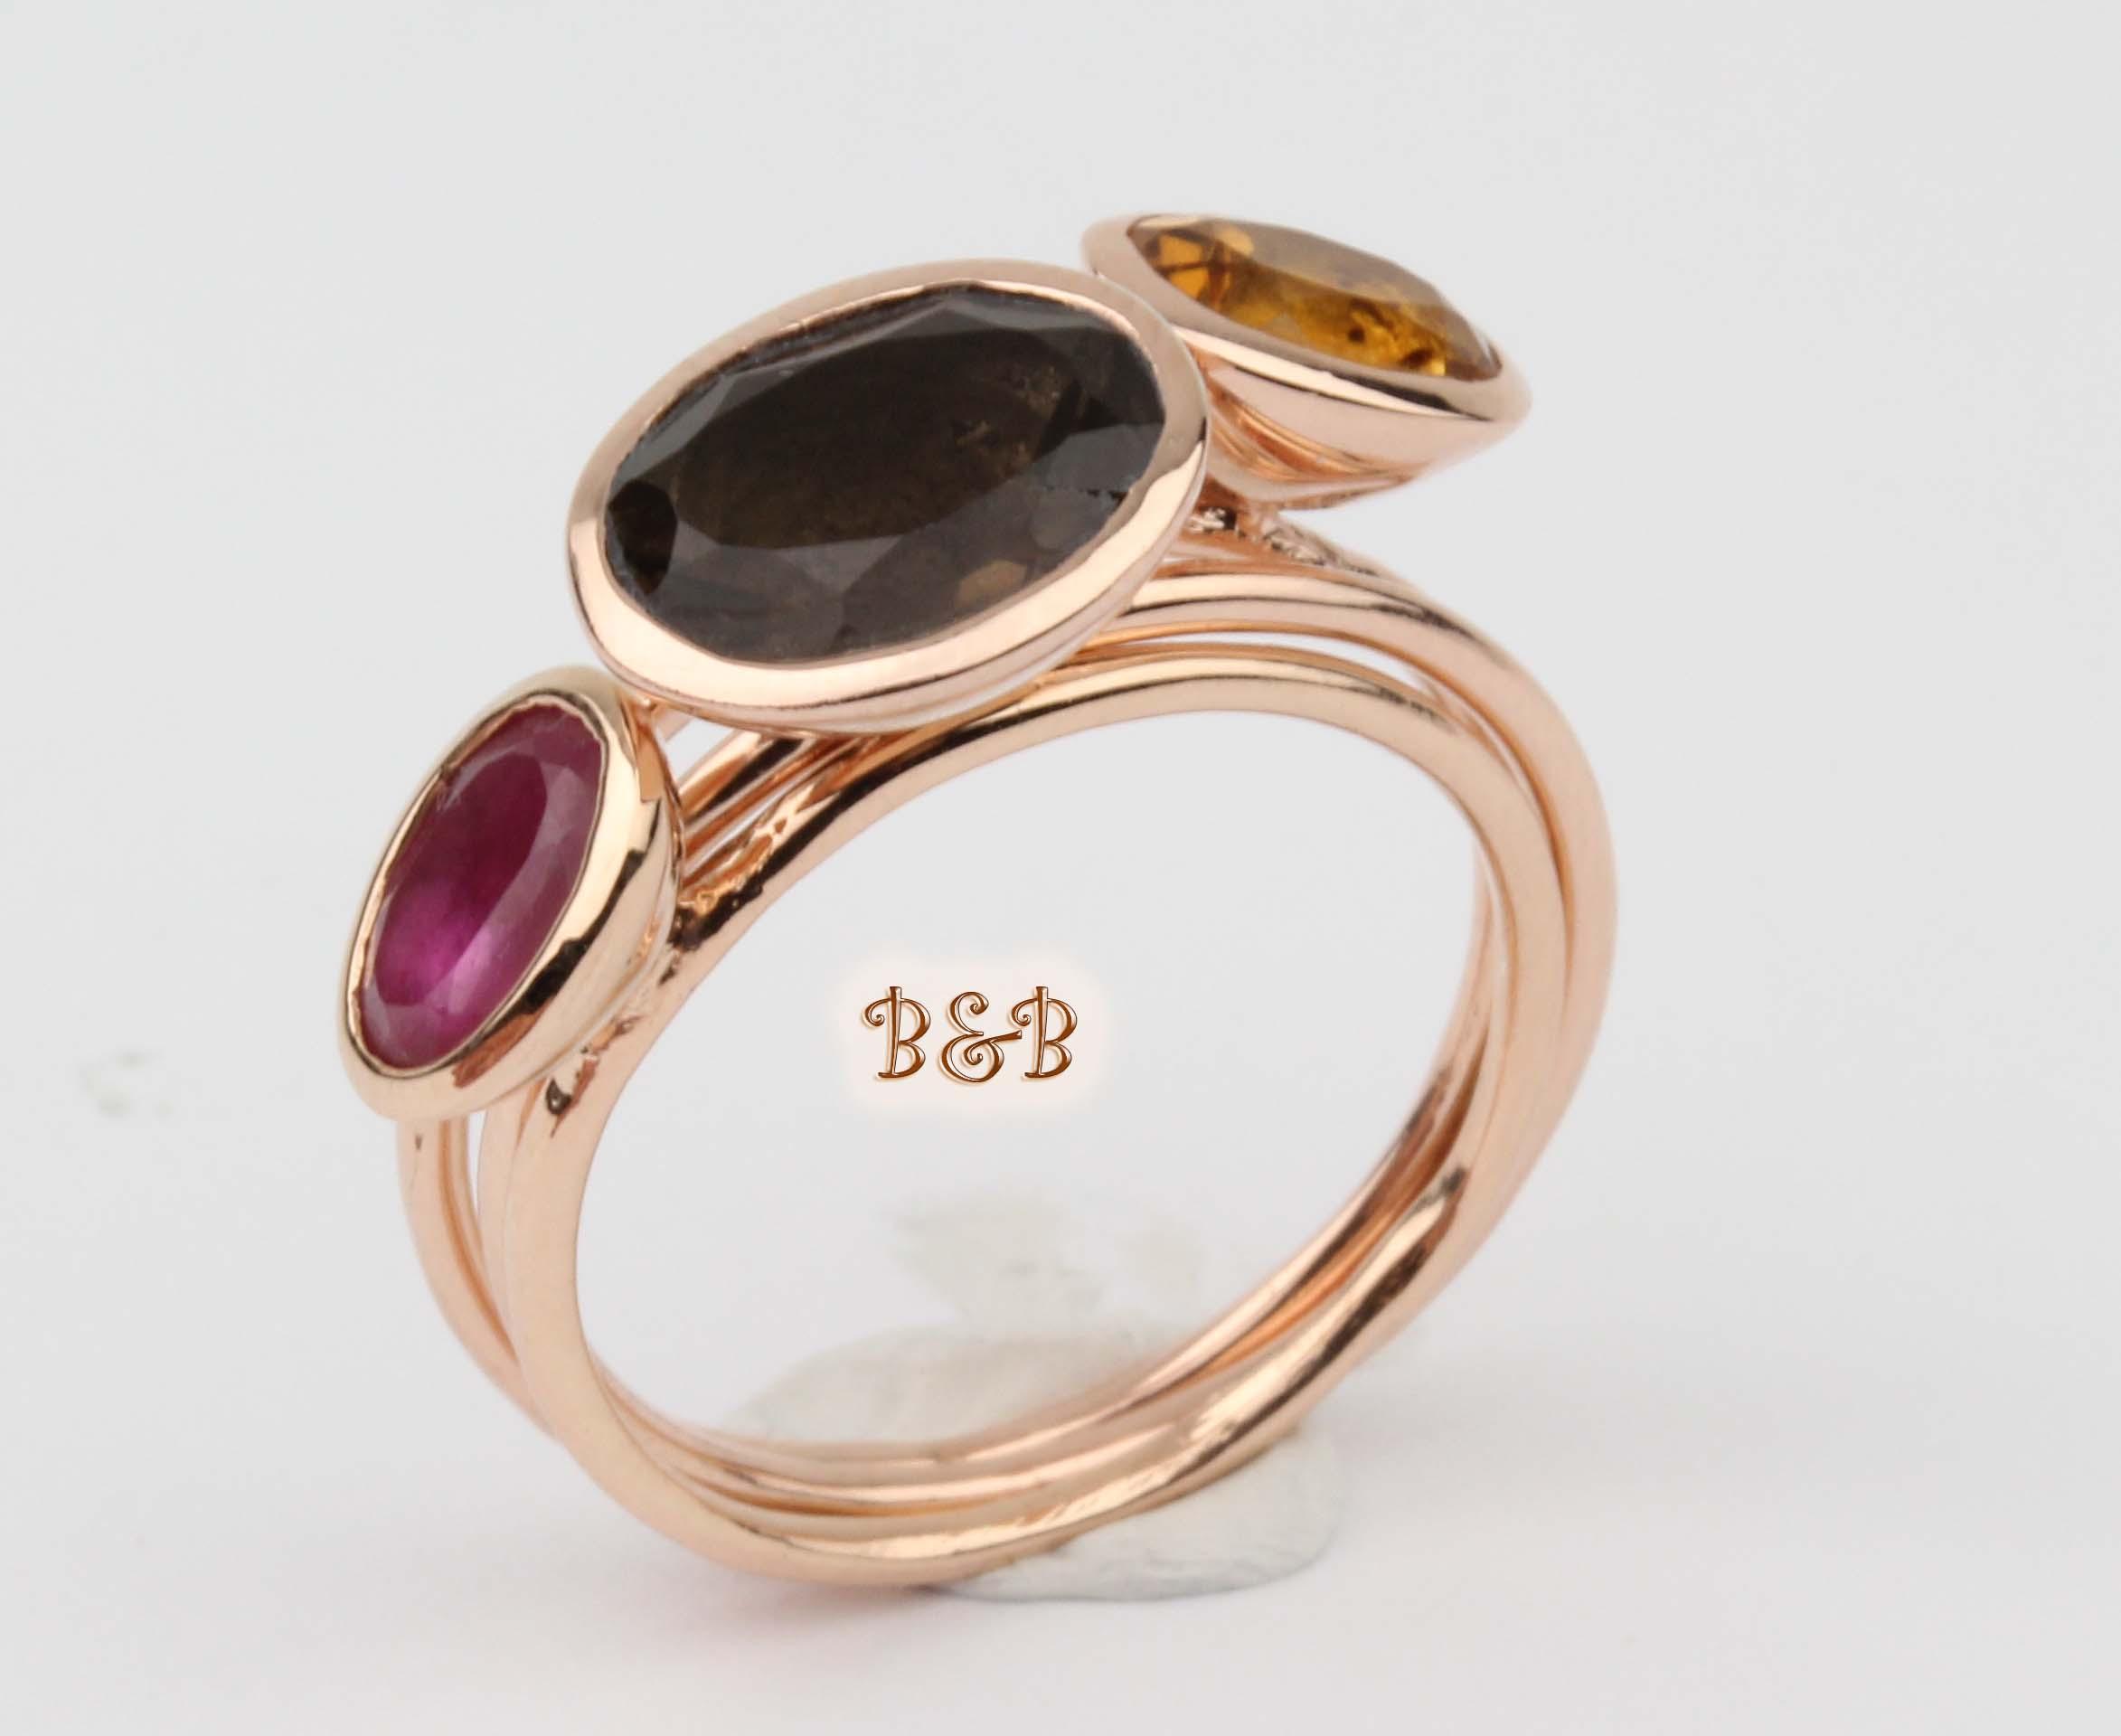 Silver ring_B&B_1871